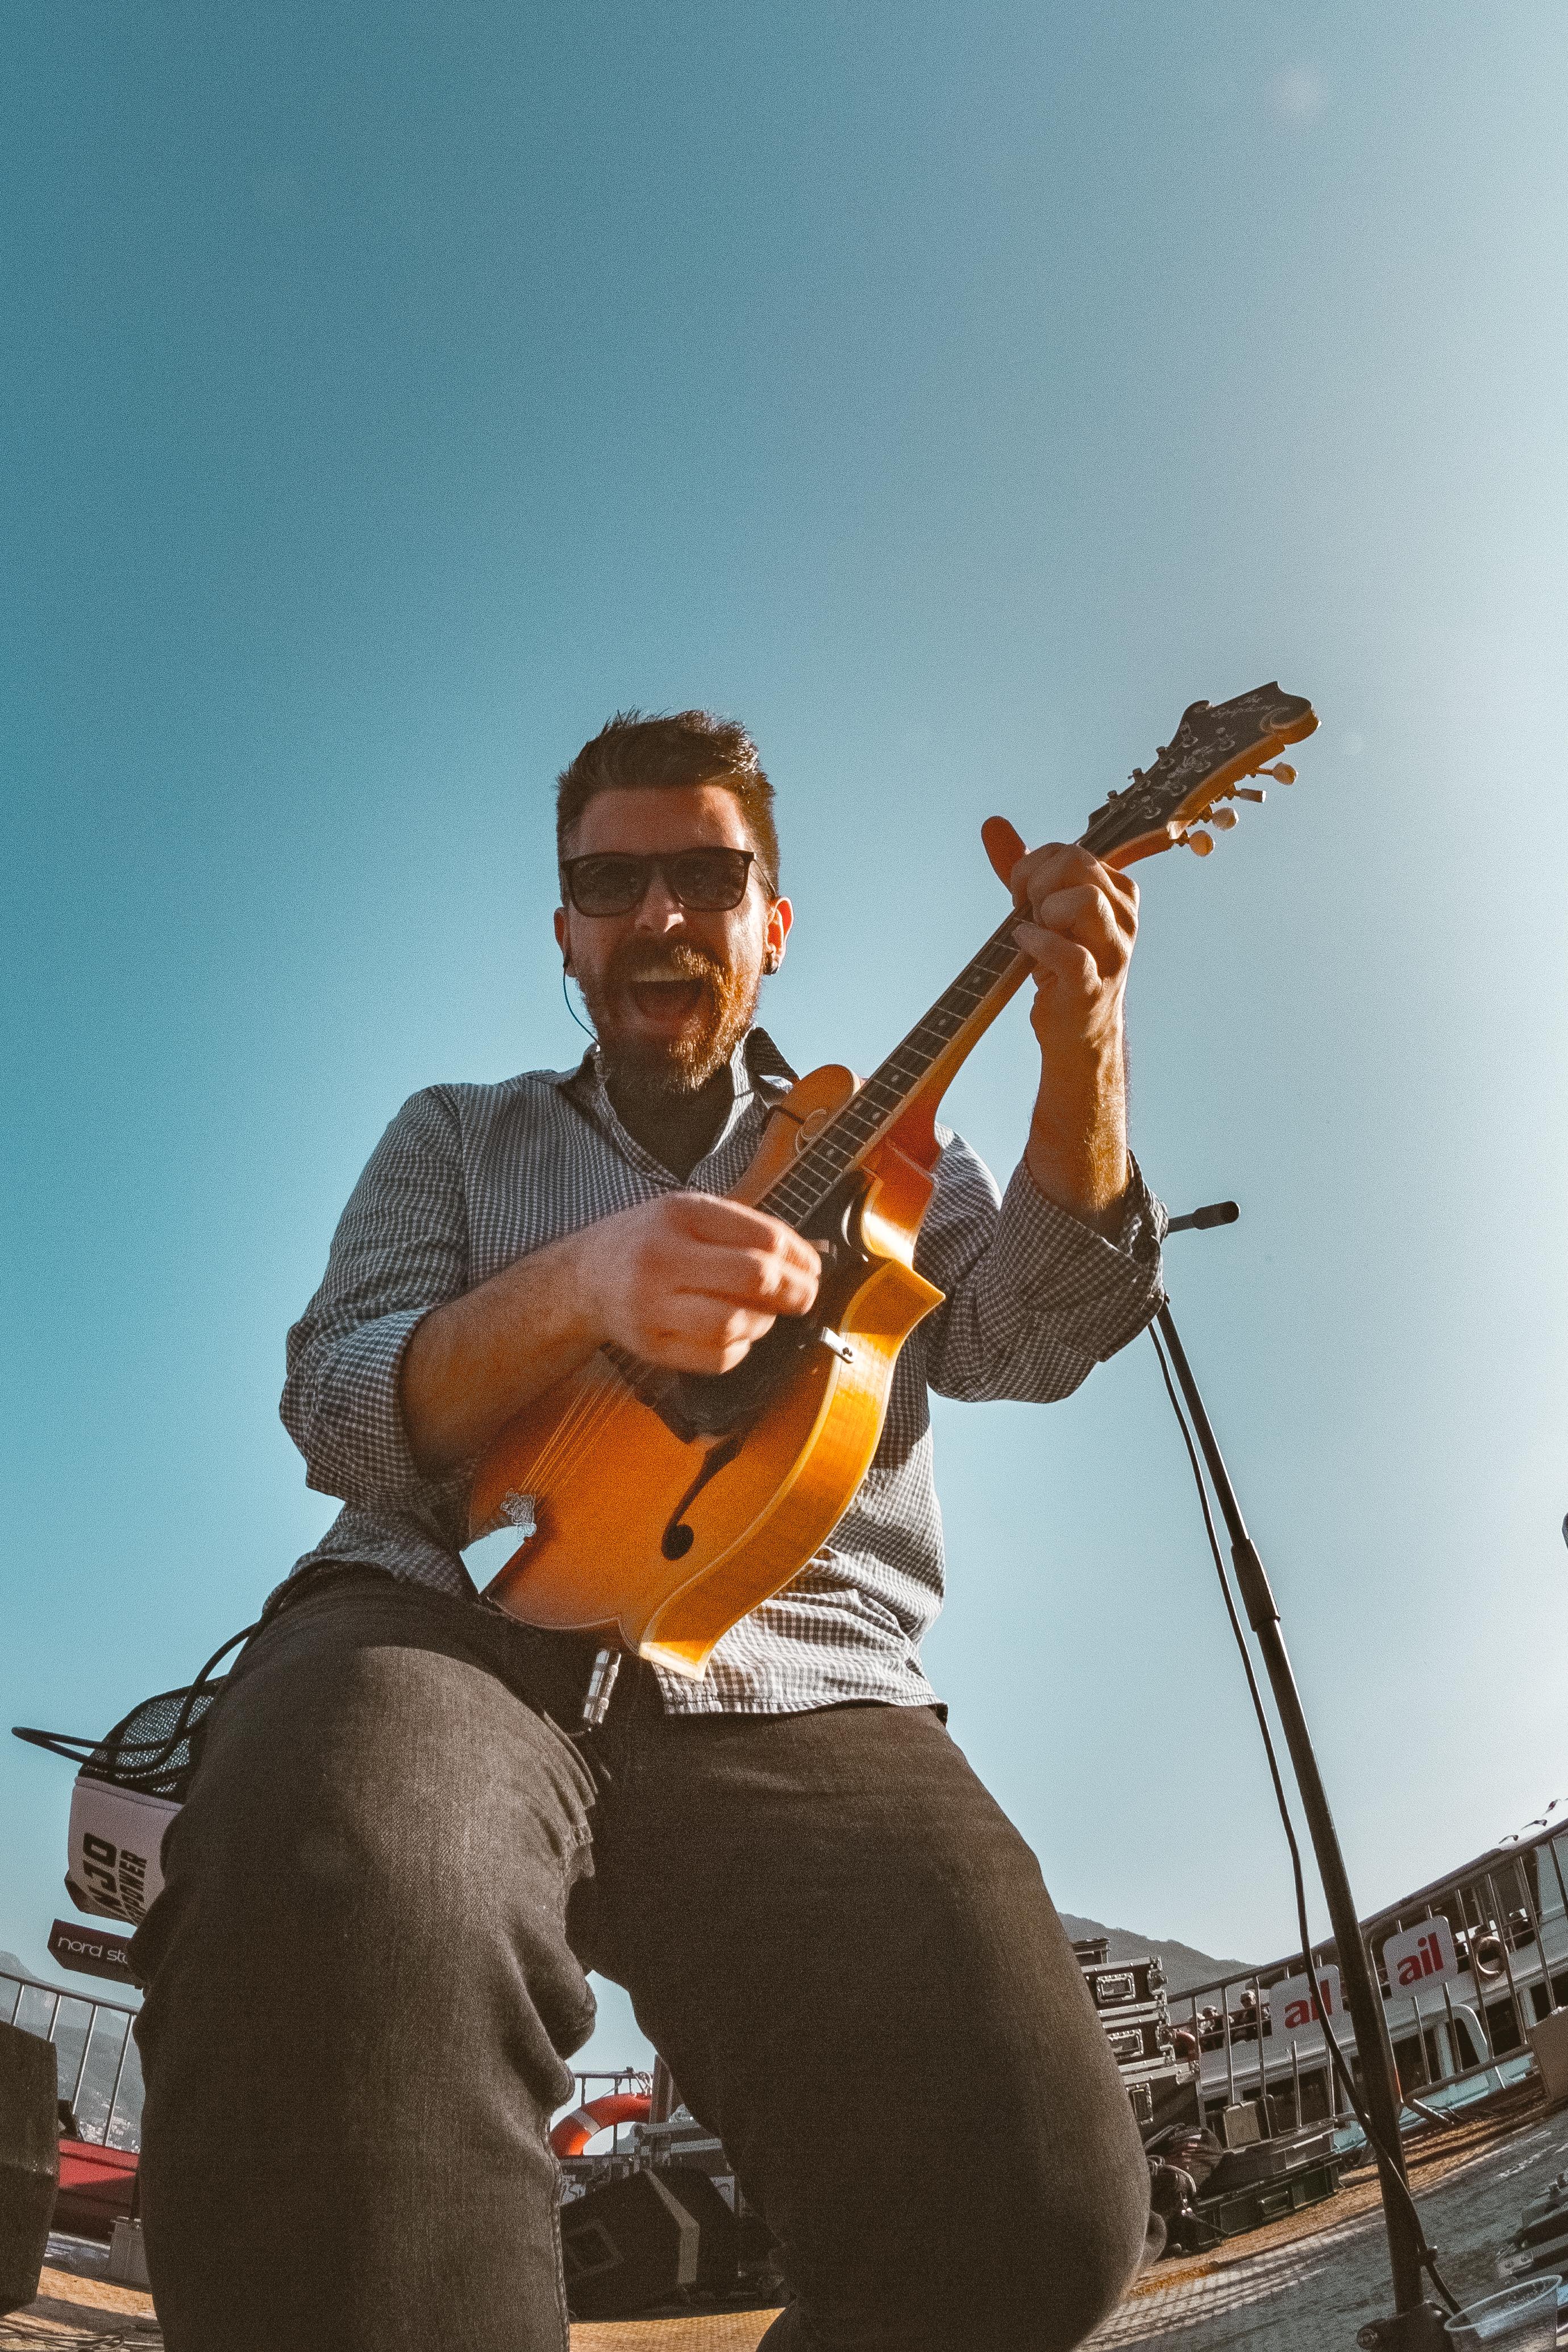 Man in Sunglasses Playing Jazz Guitar